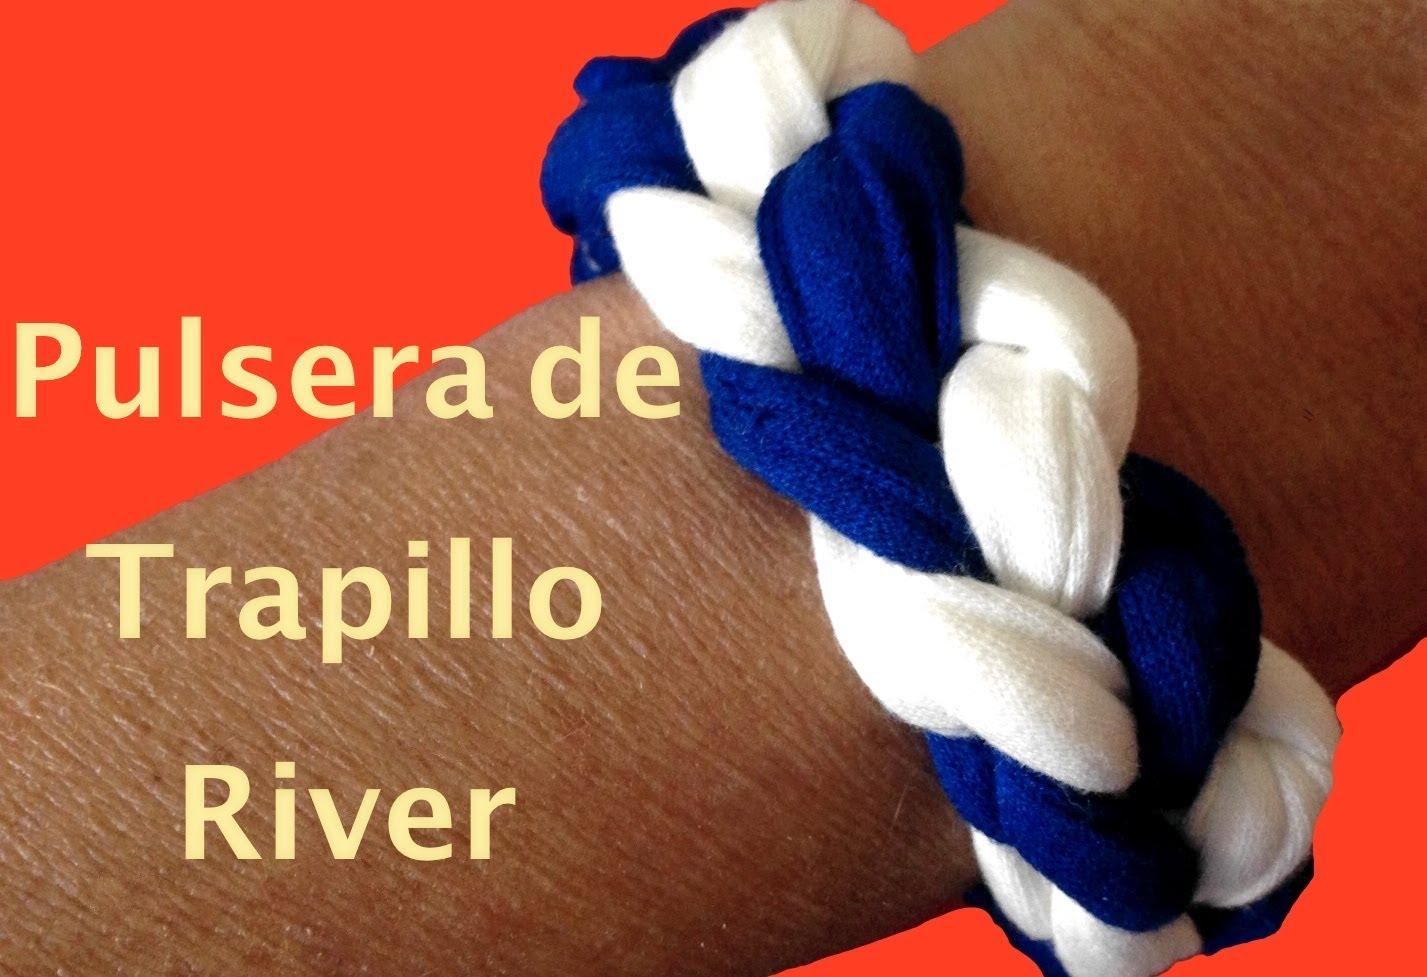 Pulsera de trapillo River